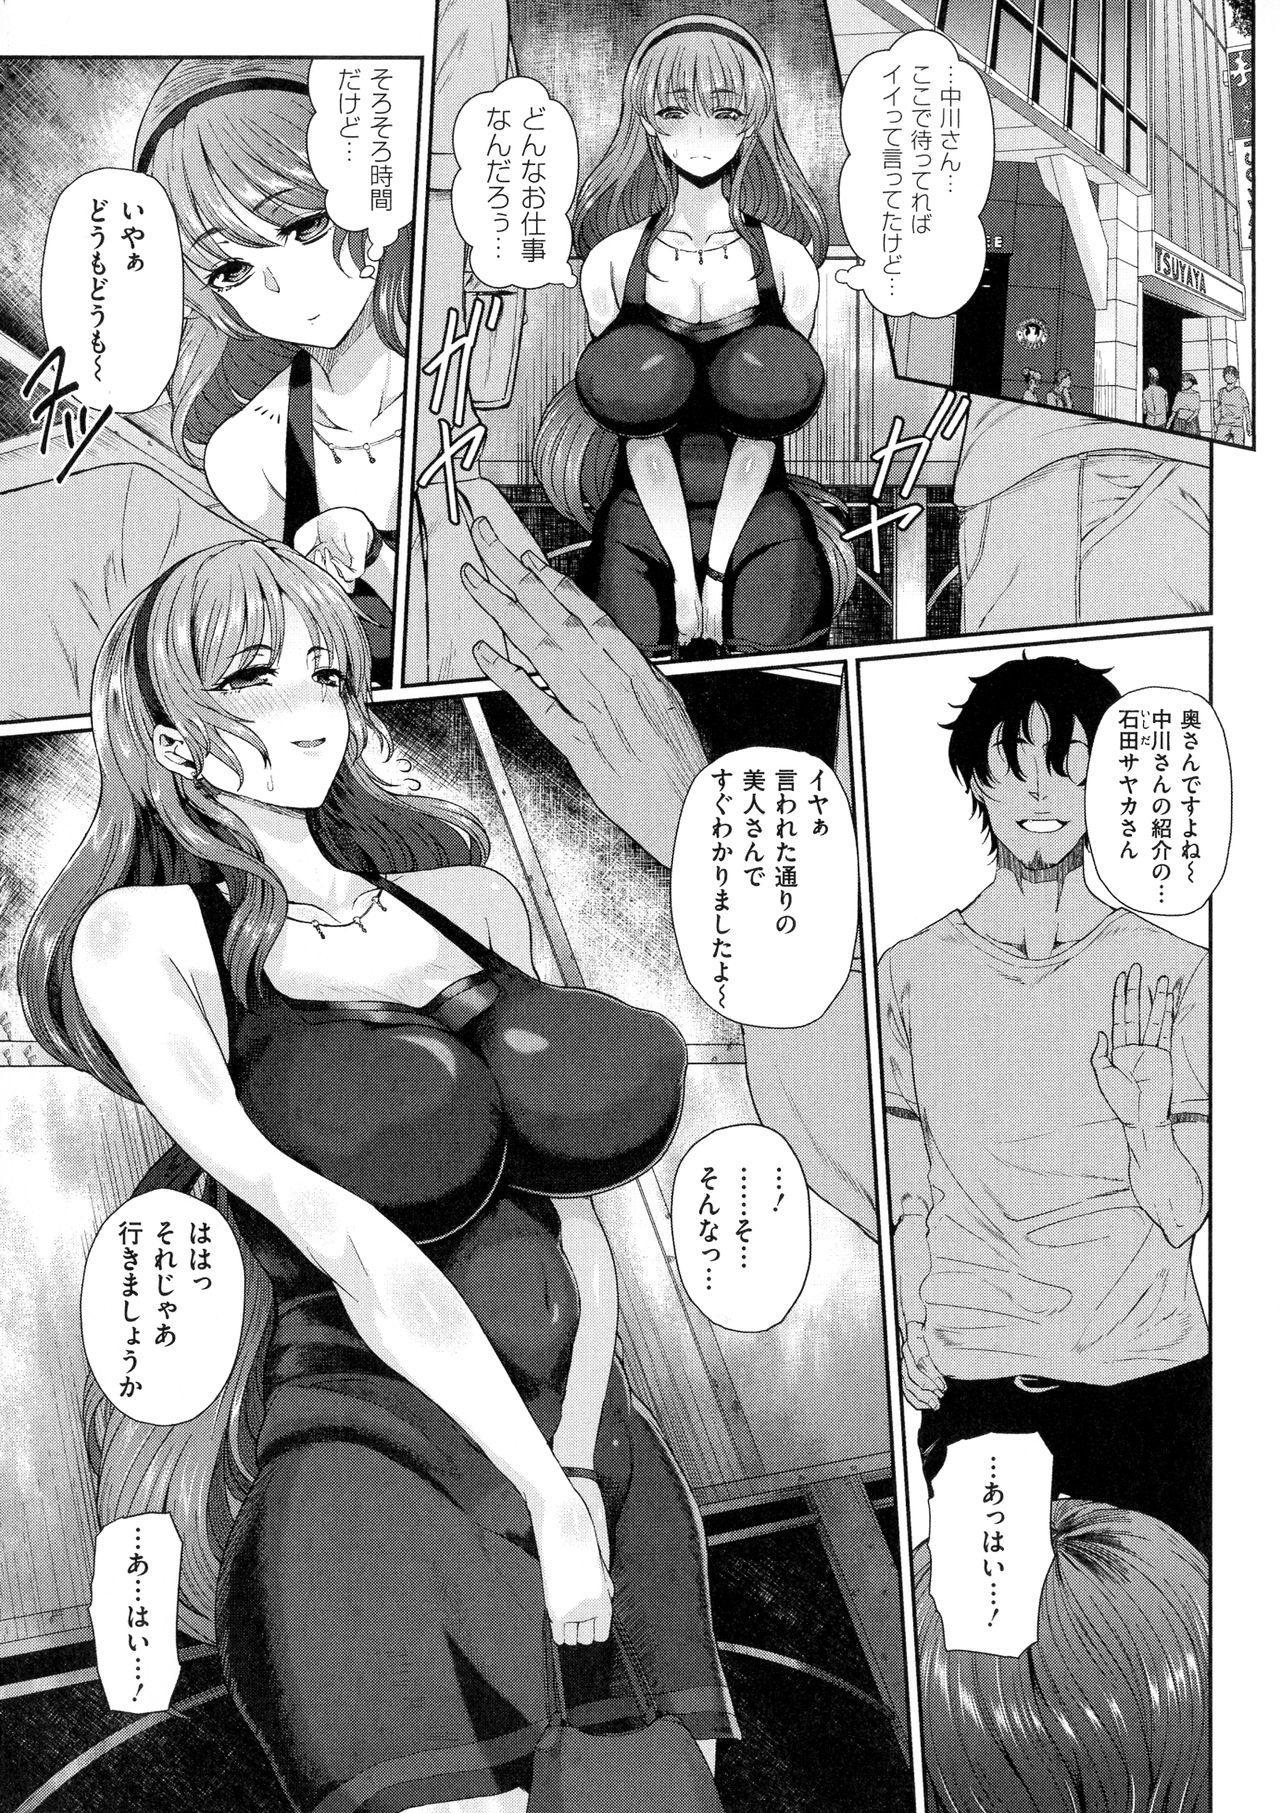 Juku Mesu - Erotic Mature Women 127